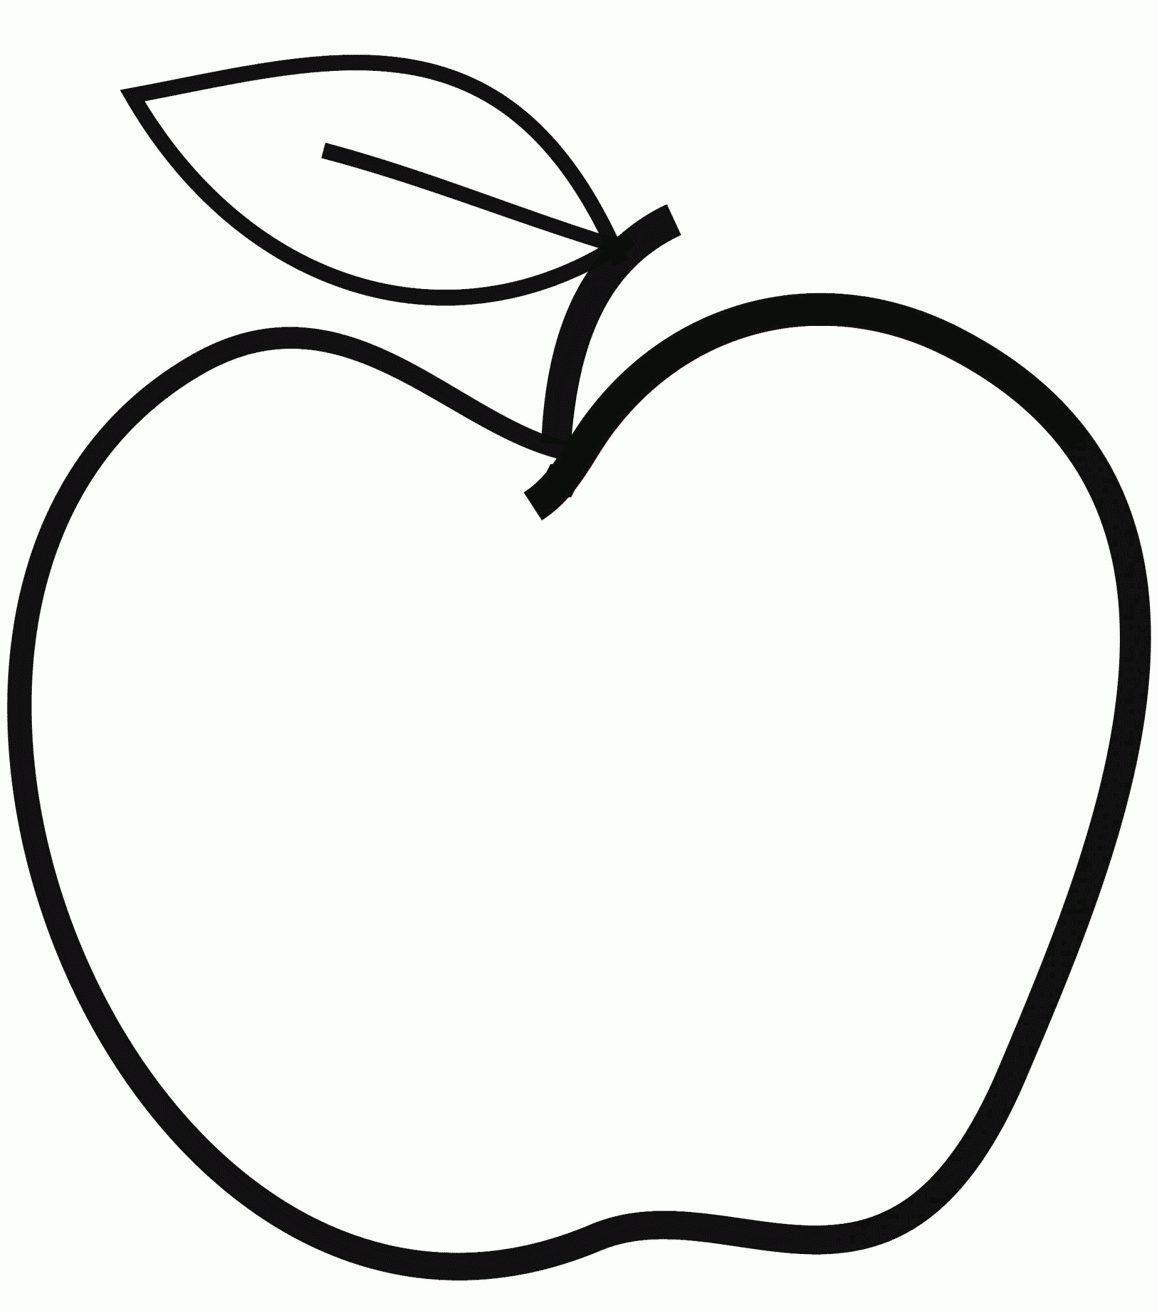 Apfel Bilder Zum Ausdrucken 2938492384234 E1537938370183 Apfel Apple Bilder Color Coloring H Bilder Zum Ausdrucken Schablonen Zum Ausdrucken Apfel Bilder